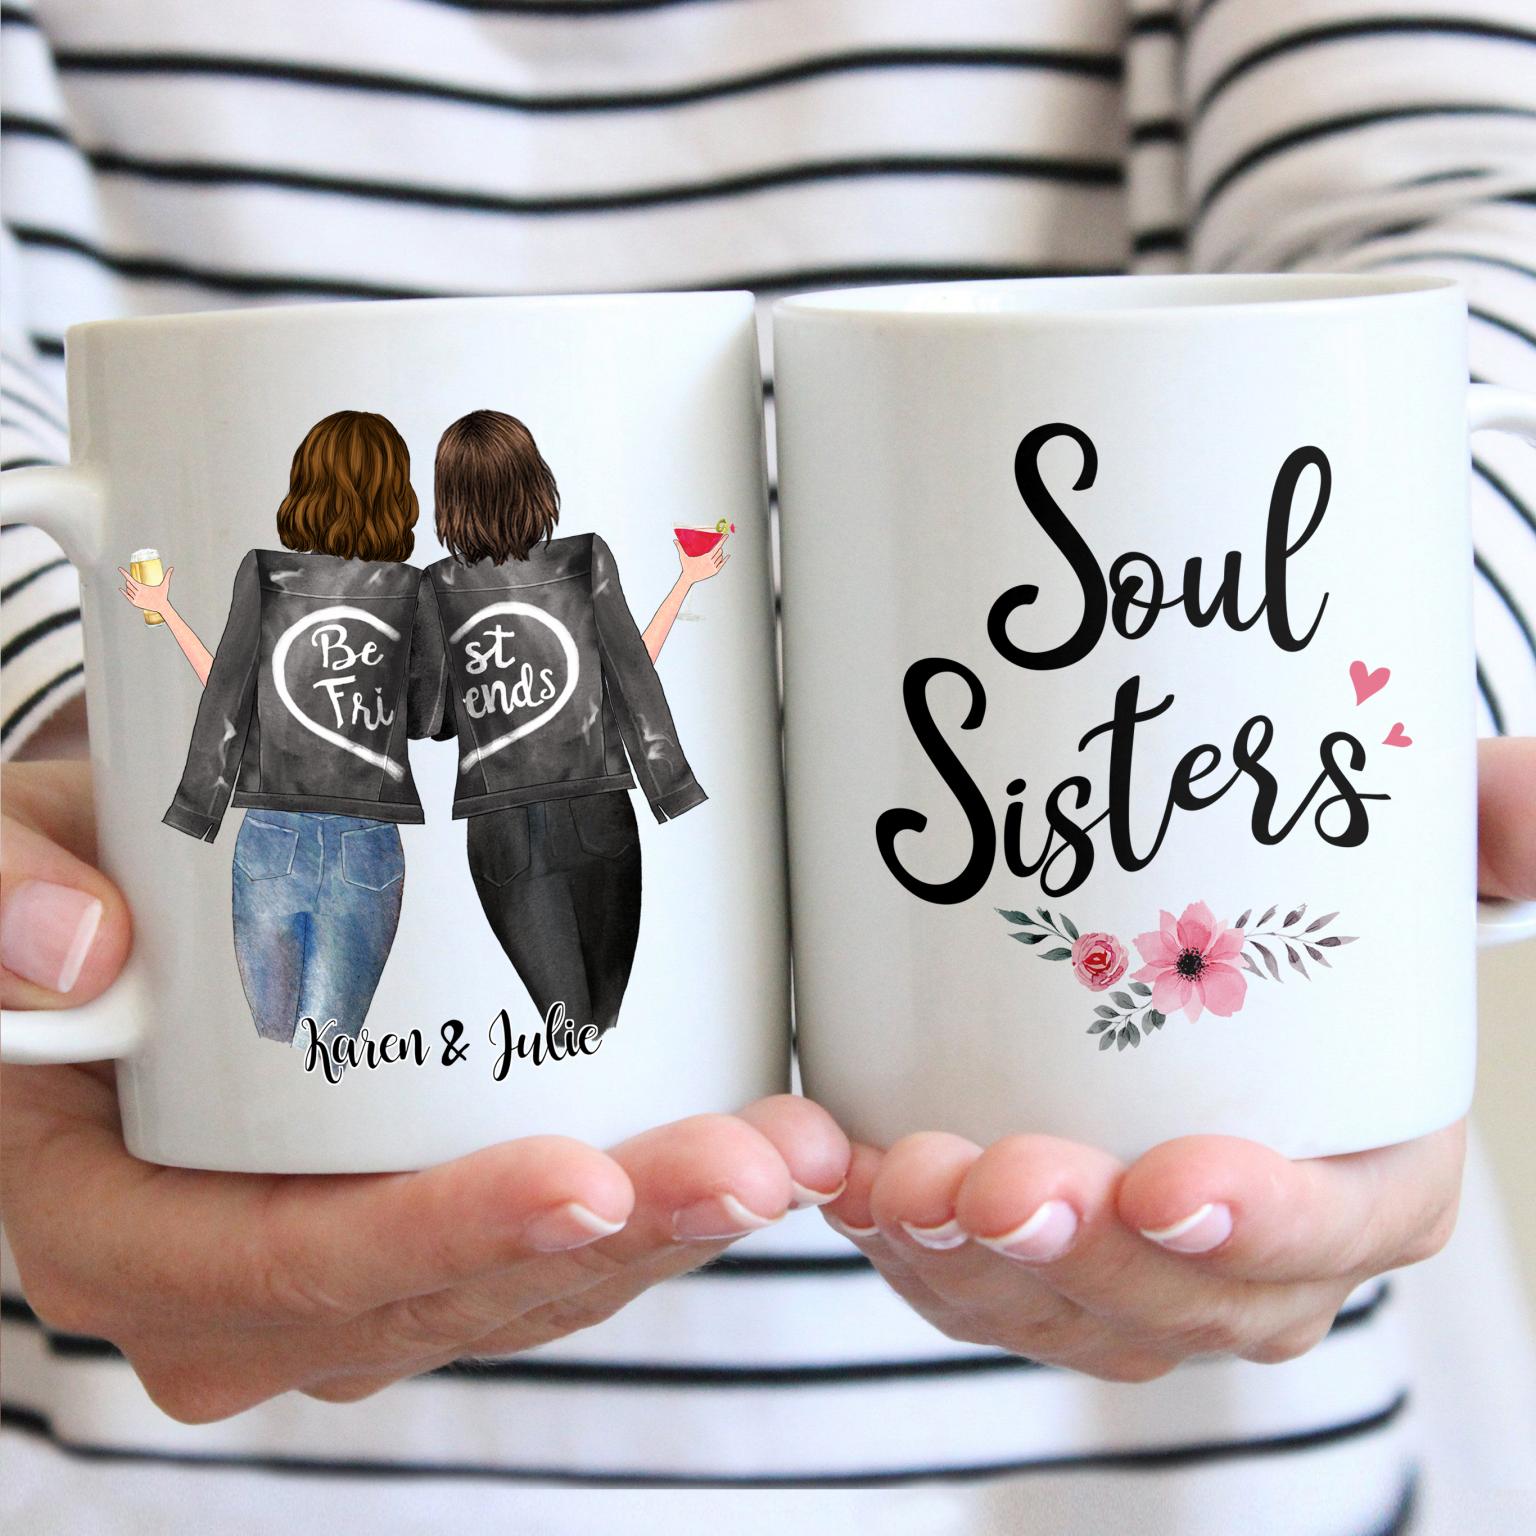 gossby cadeau geek soul sisters